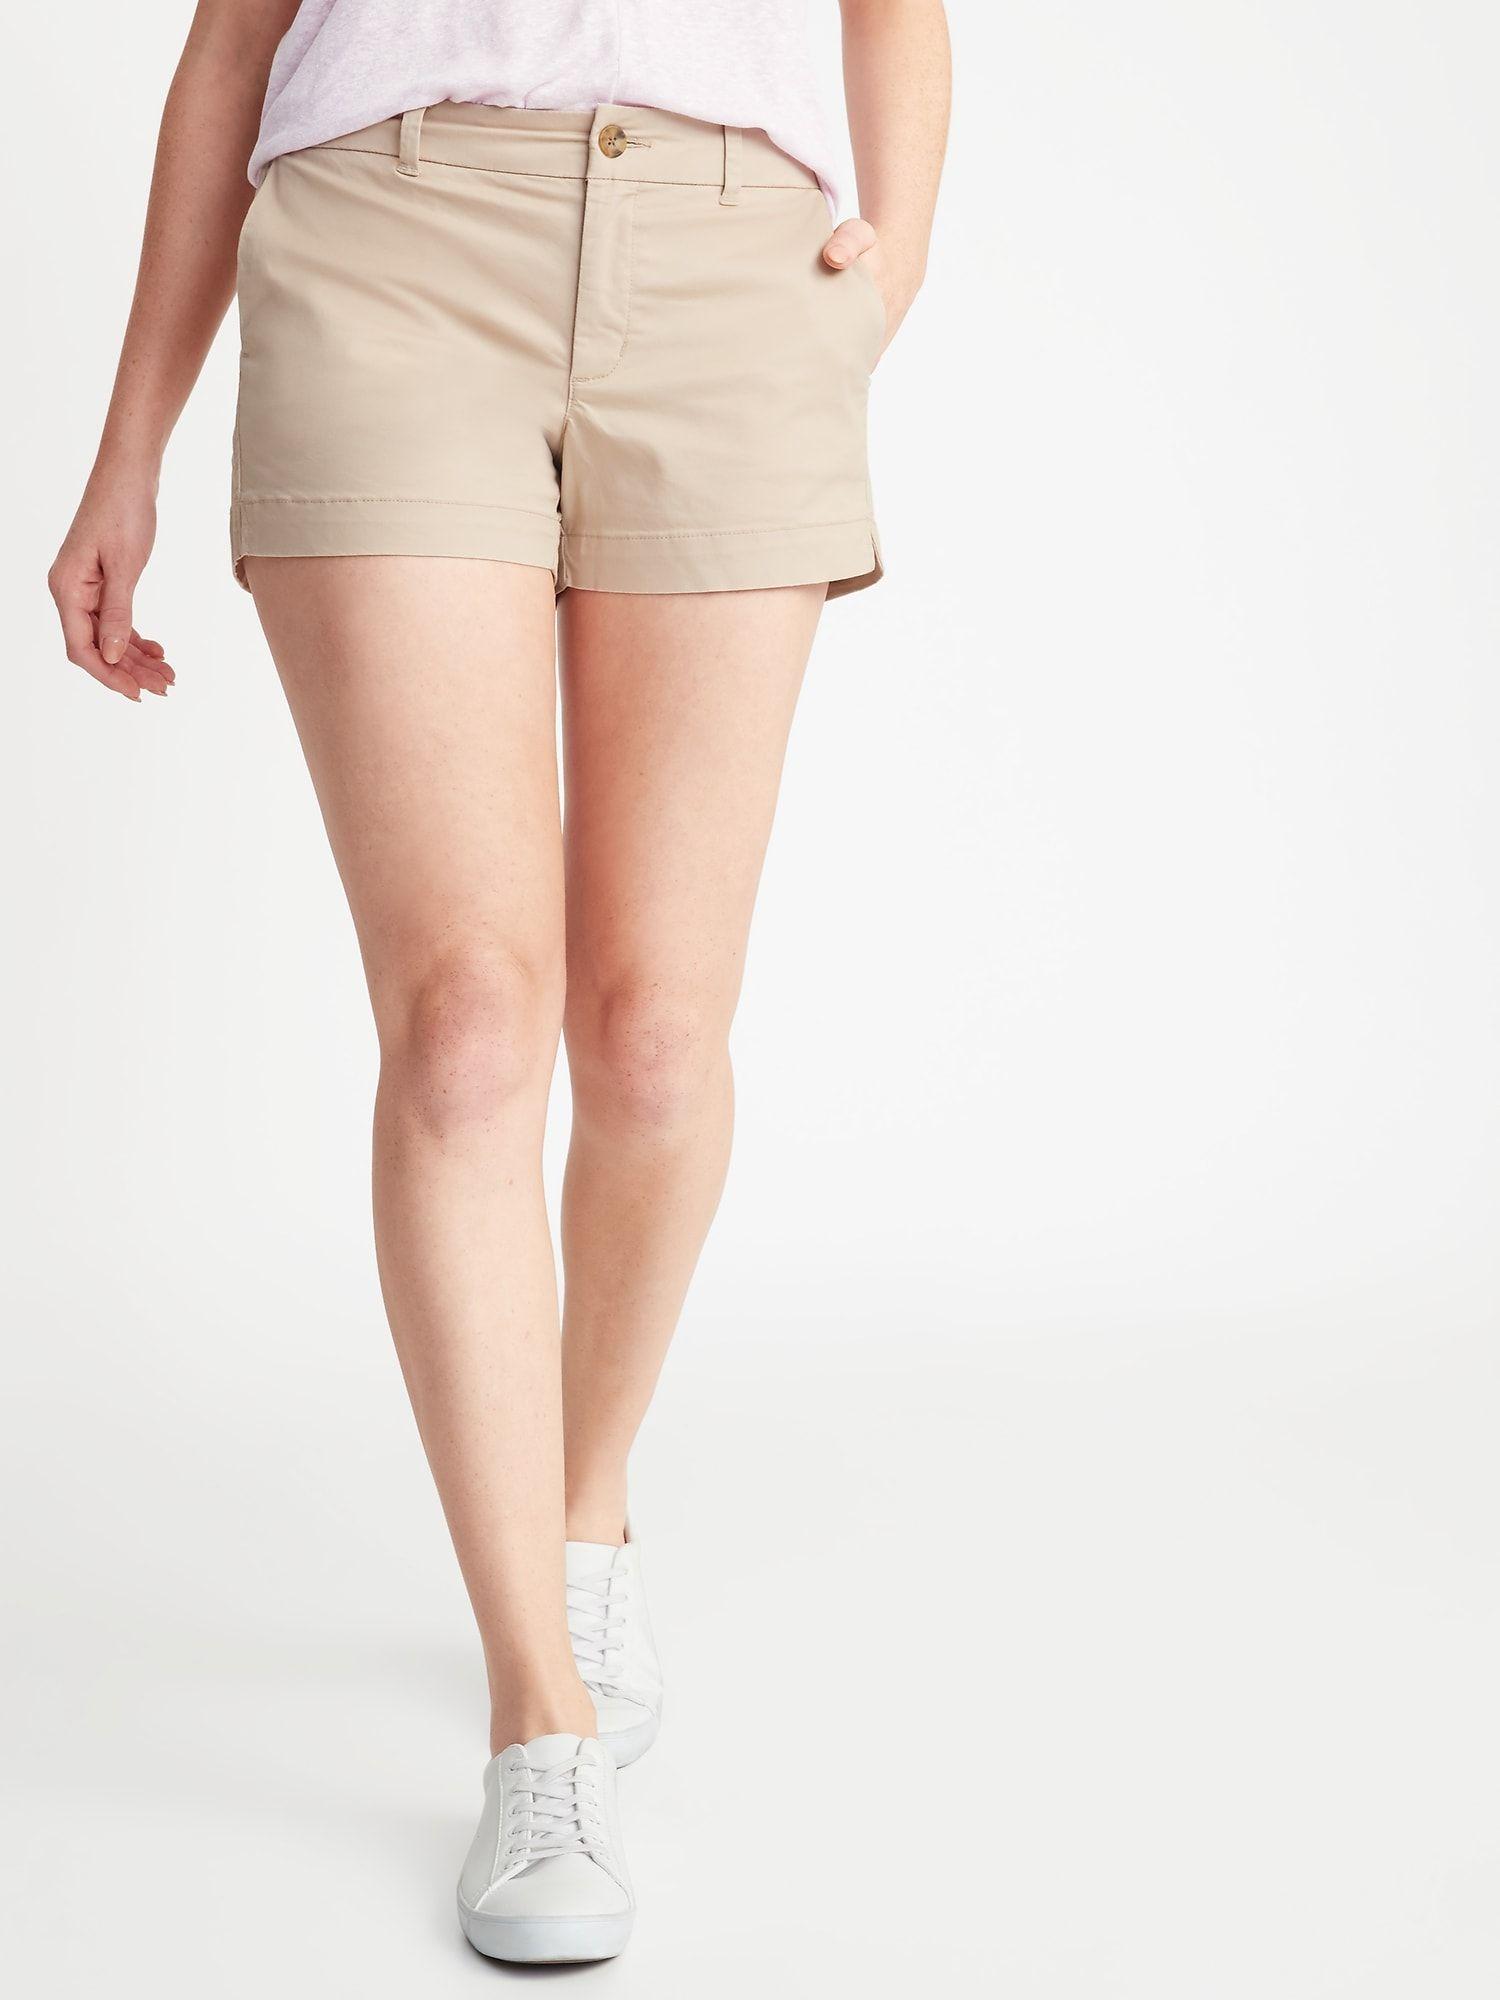 27++ 2 inch inseam womens shorts ideas